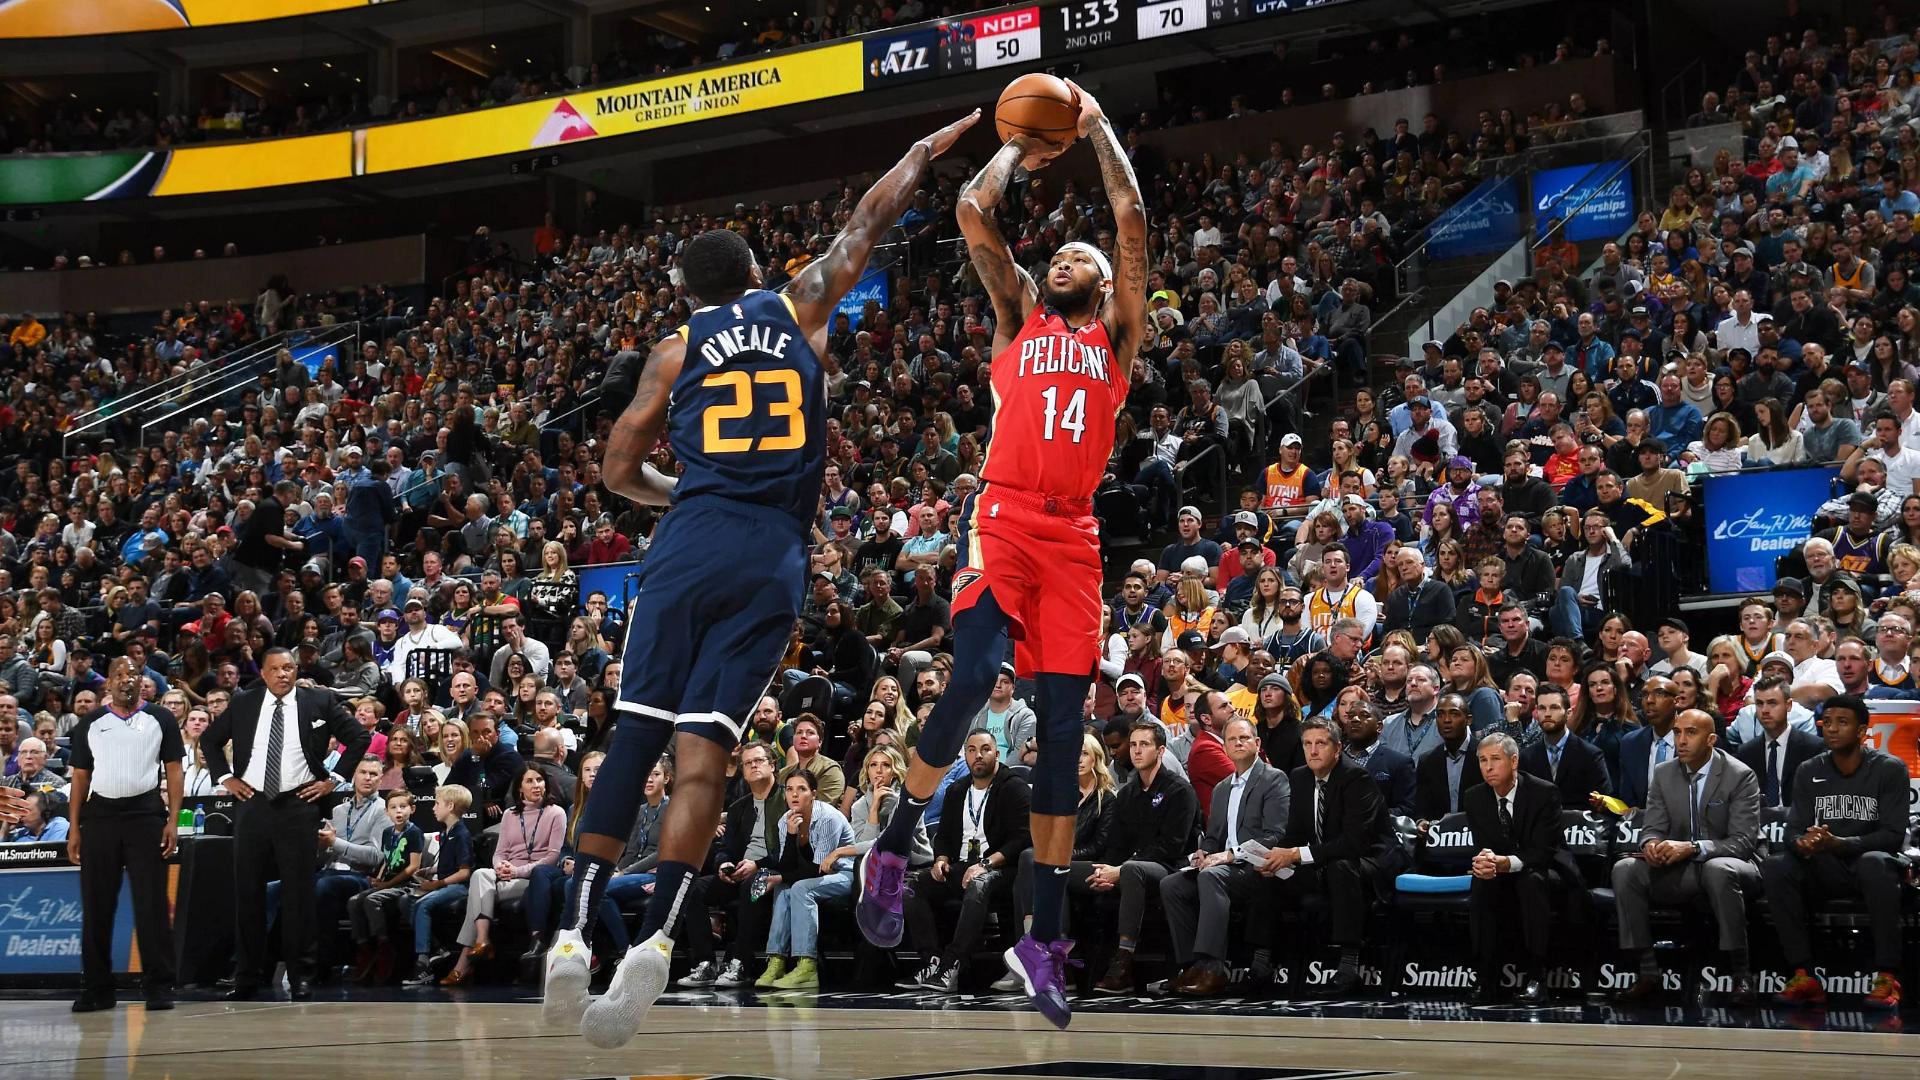 2019-2020 NBA常规赛 犹他爵士 VS 新奥尔良鹈鹕 集锦Part1